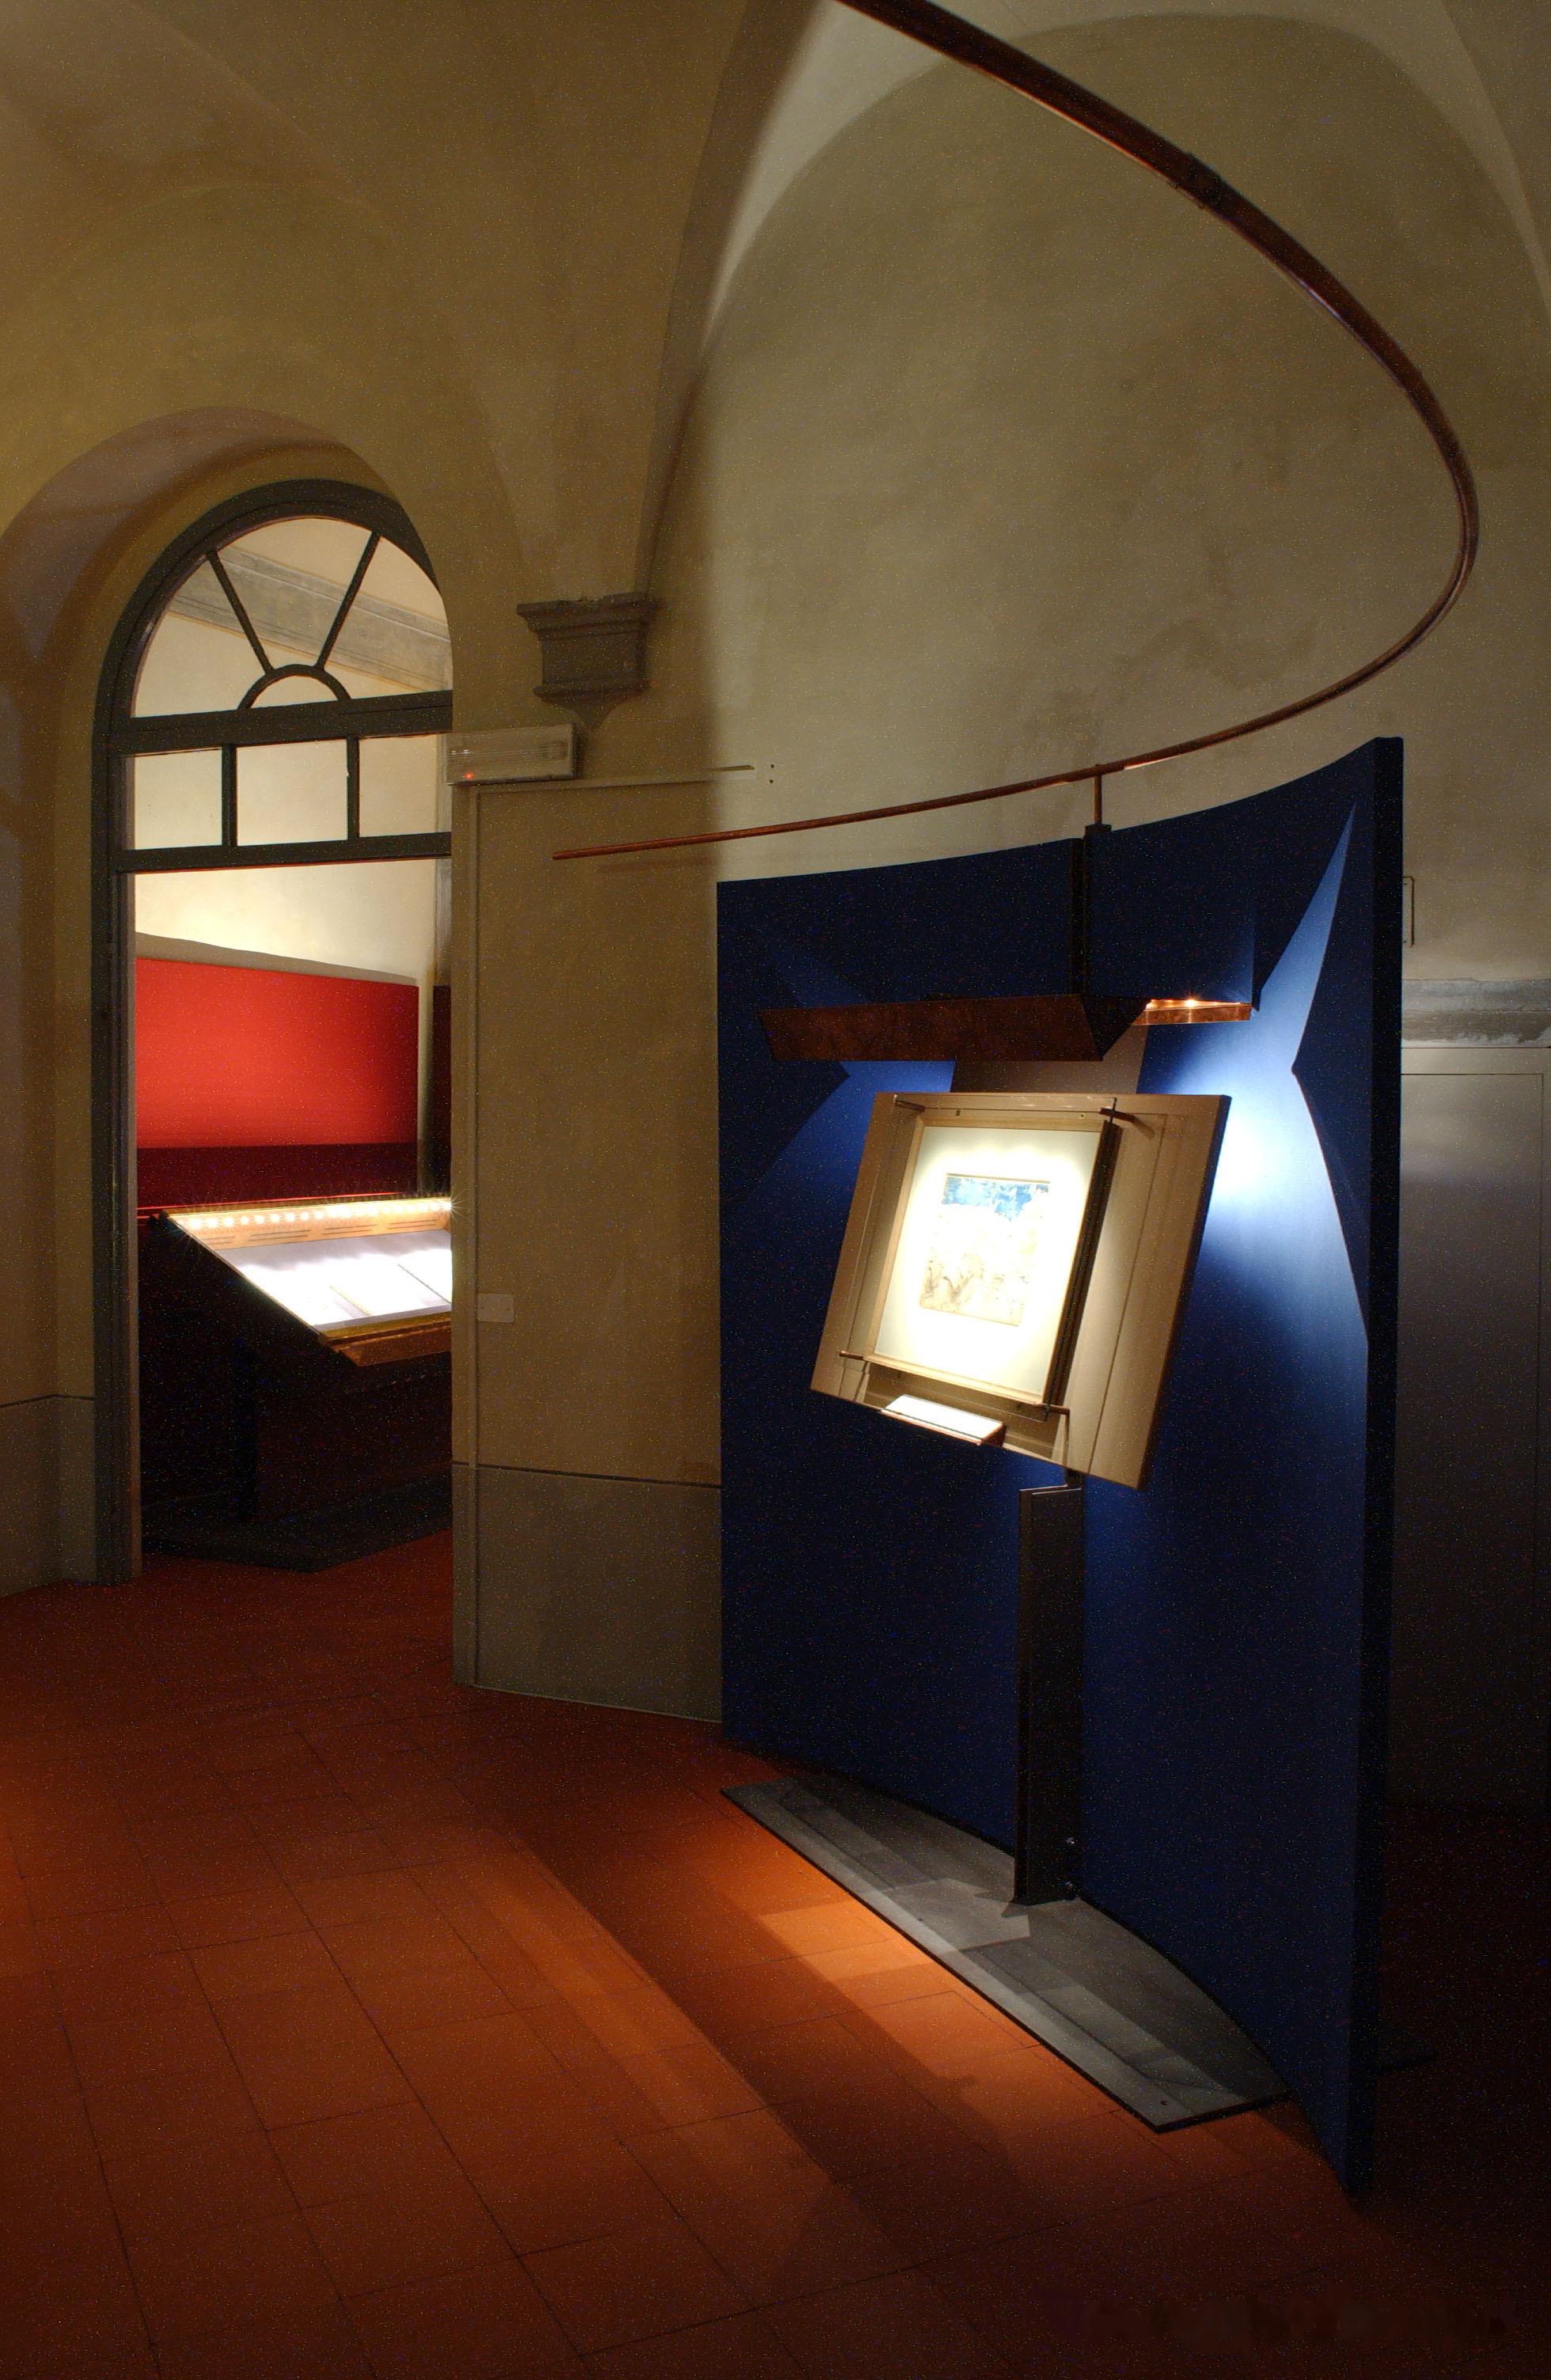 LEONARDO GENIO E CARTOGRAFO  Arezzo, 2003